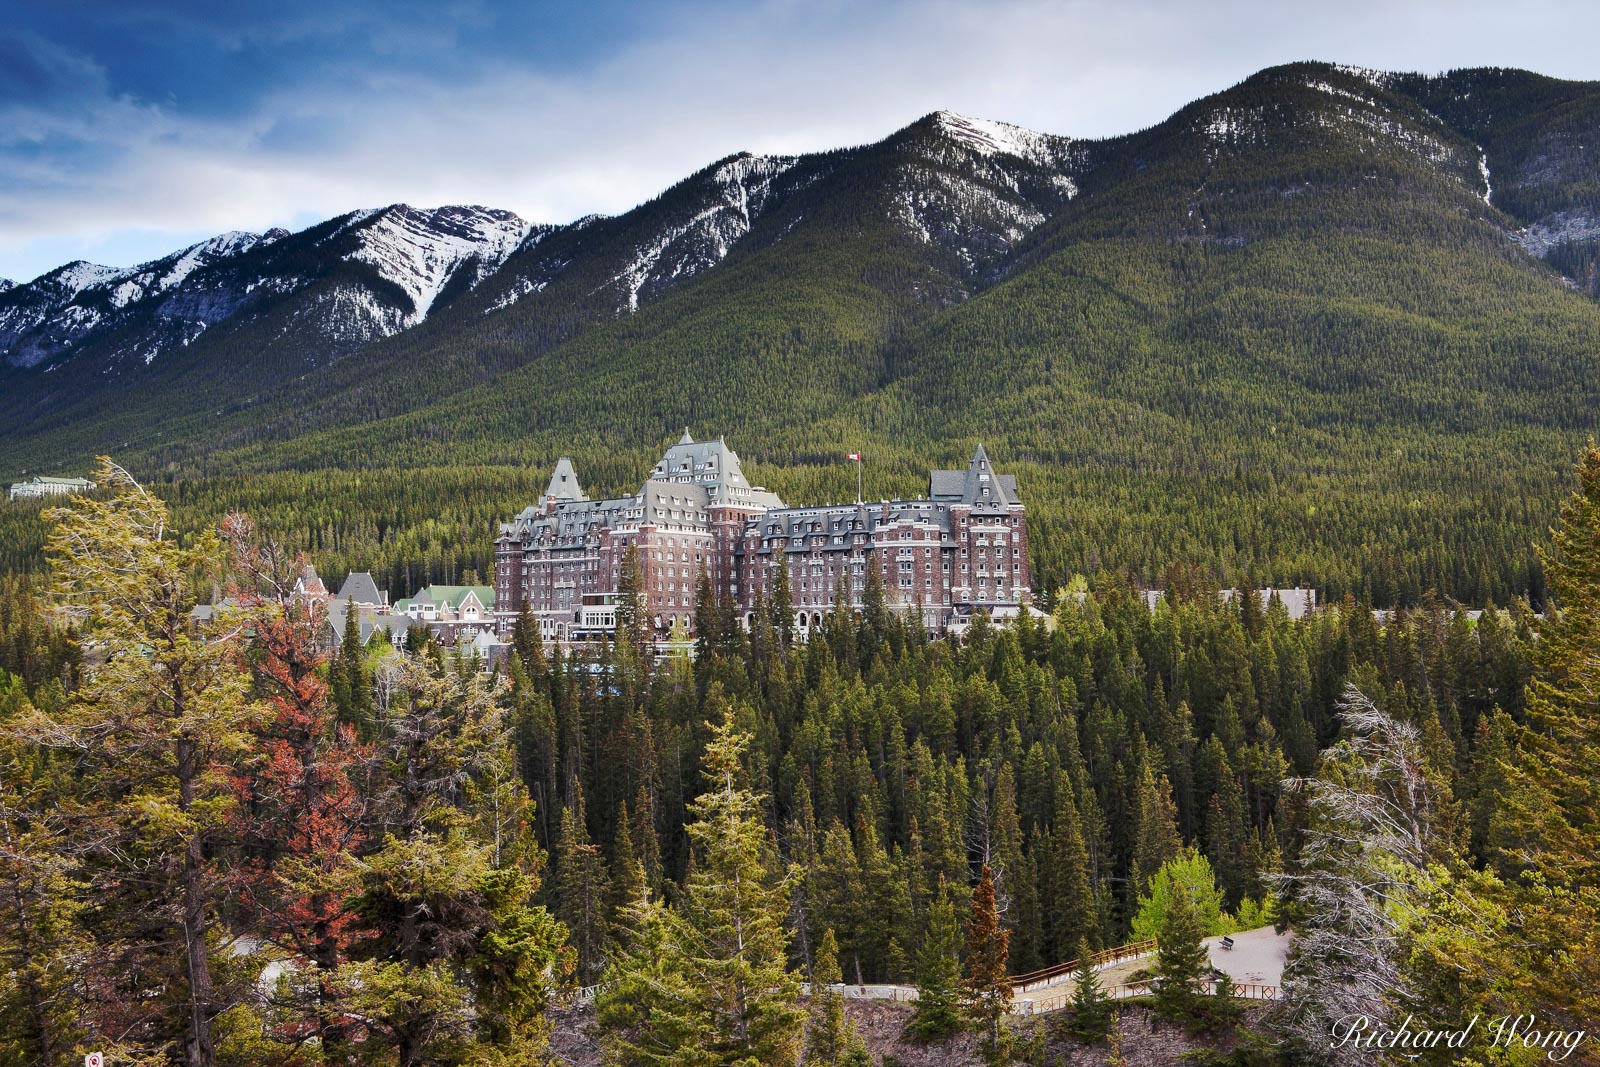 Fairmont Banff Hot Springs Resort, Banff, Alberta, Canada, Photo, photo